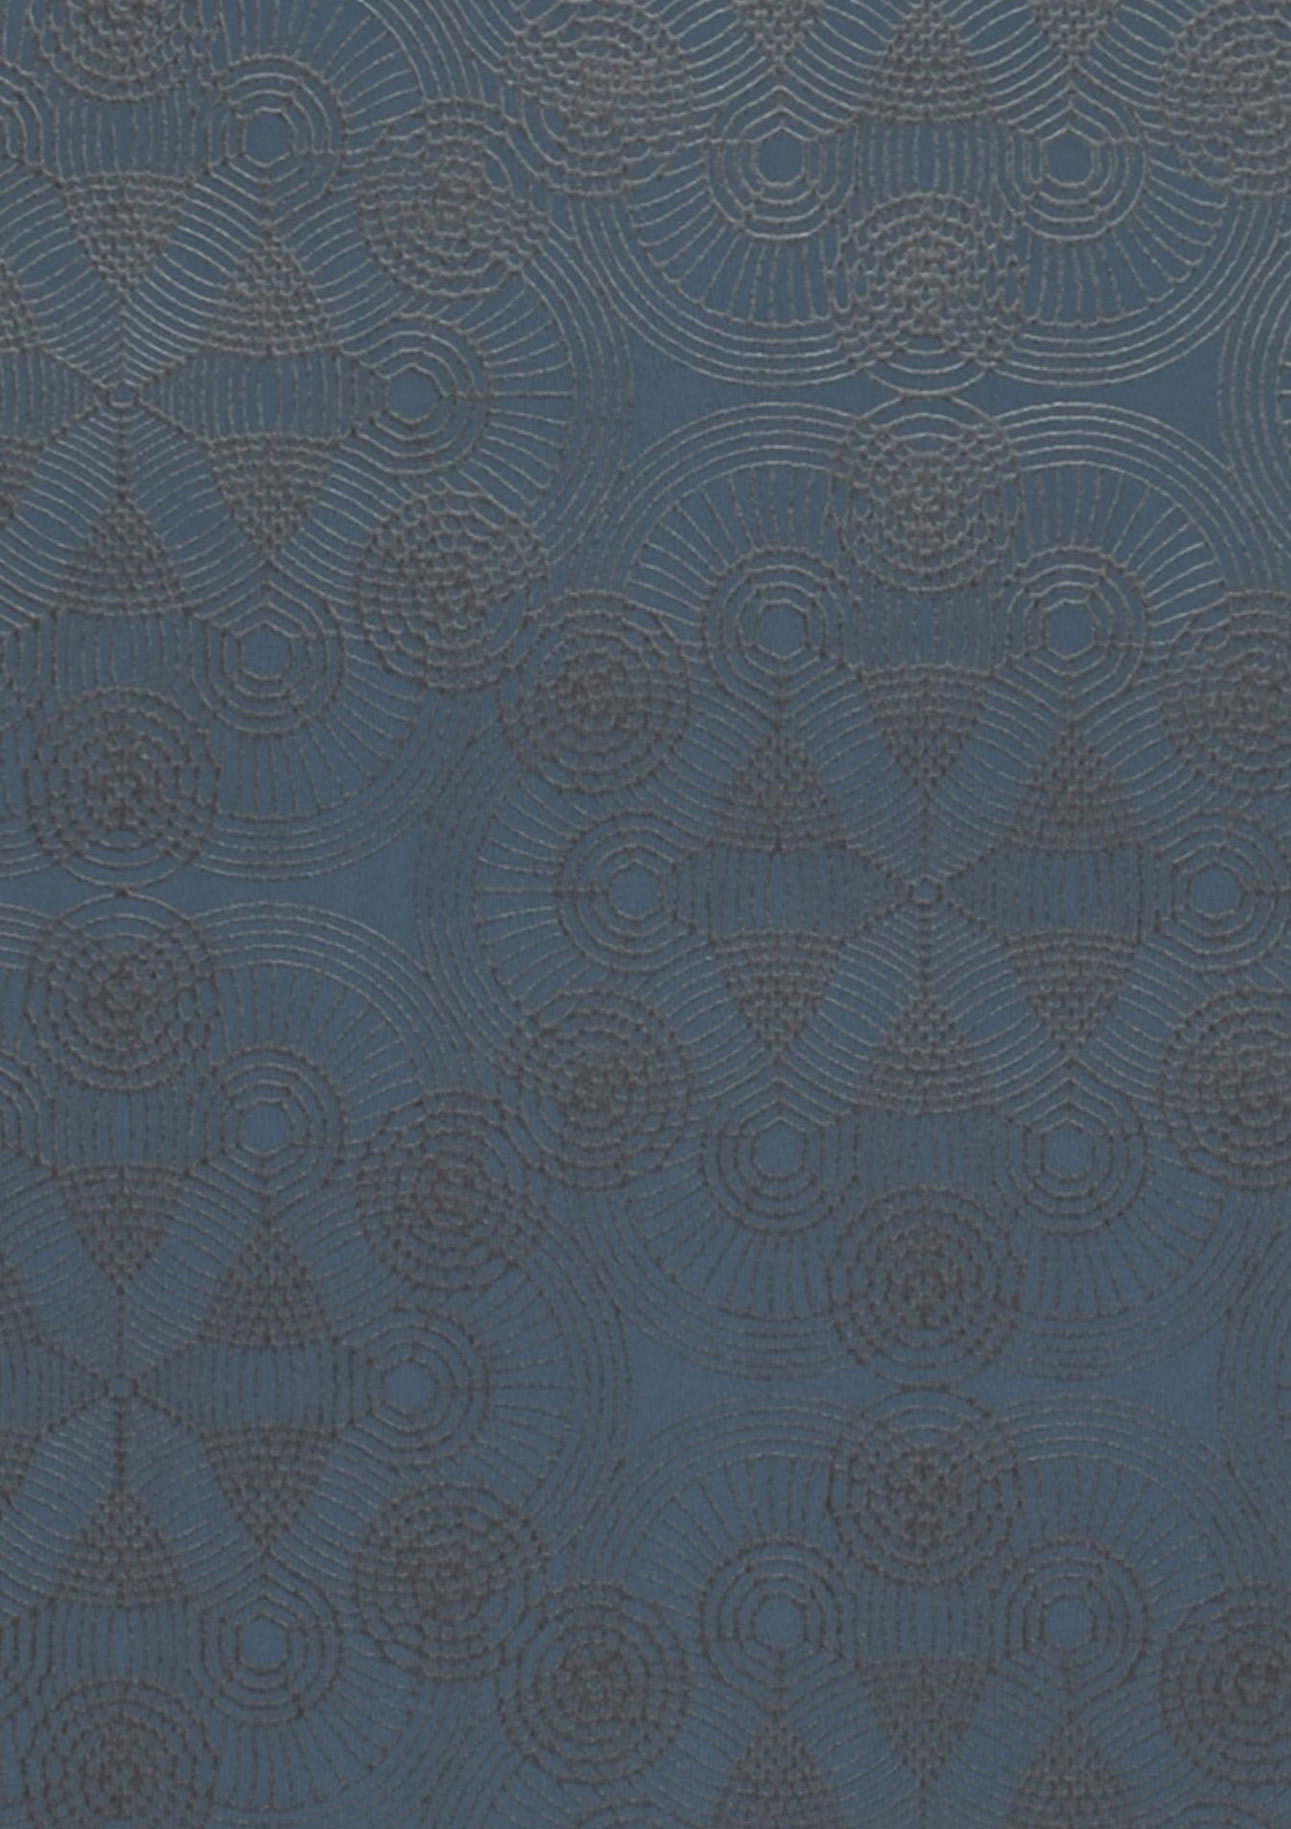 Tapete imalas taubenblau anthrazit tapeten der 70er for Tapete taubenblau